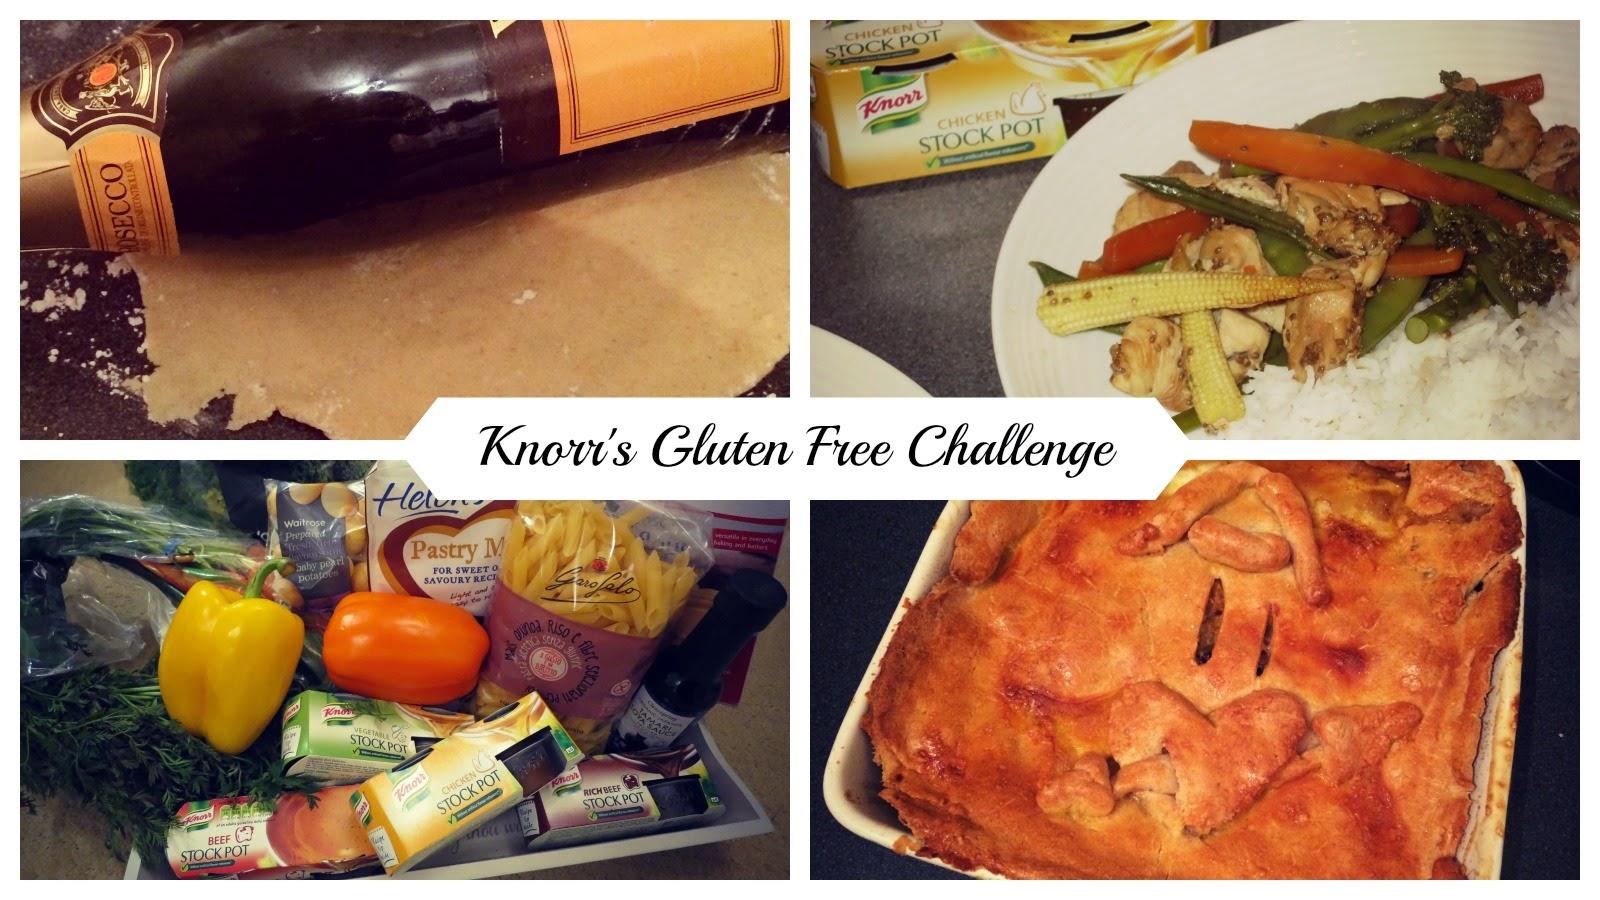 The Knorr Gluten Free Challenge